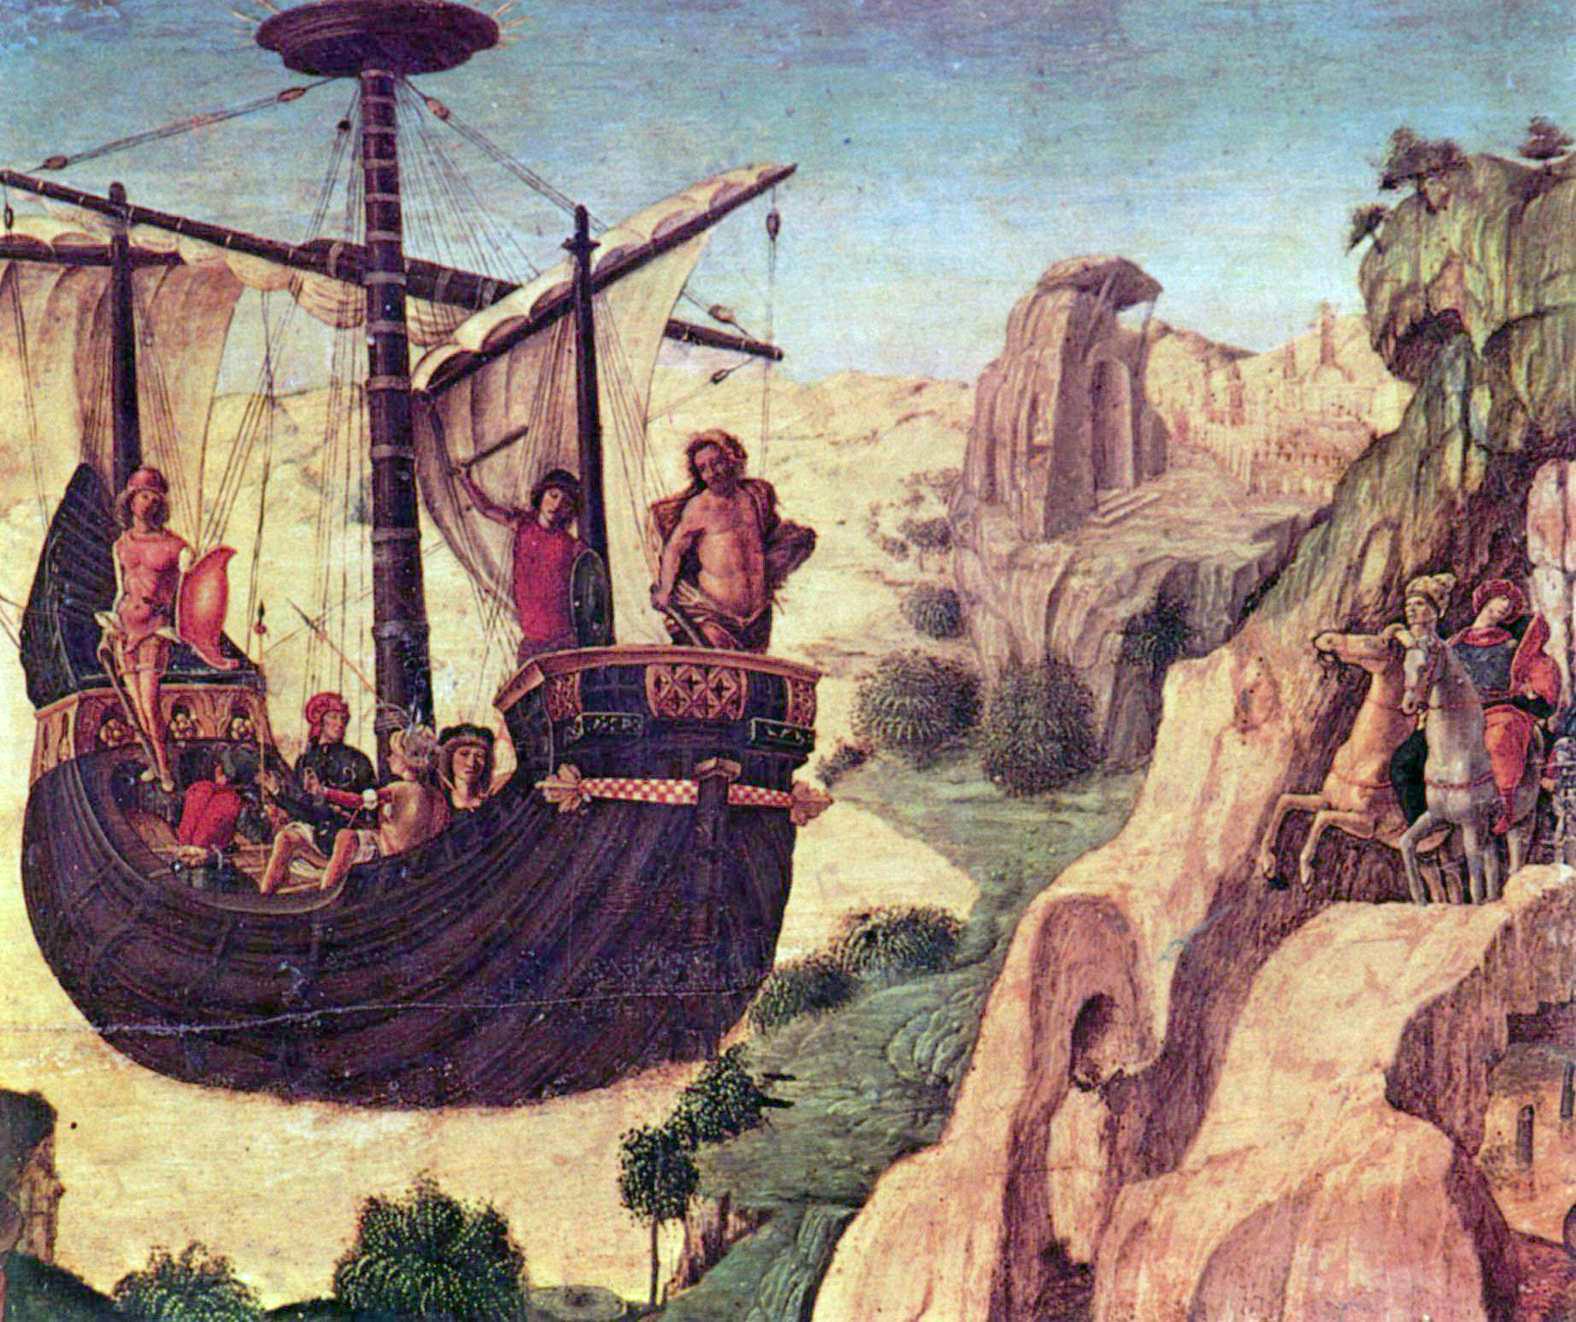 The Argo Renaissance painting by Lorenzo Costa